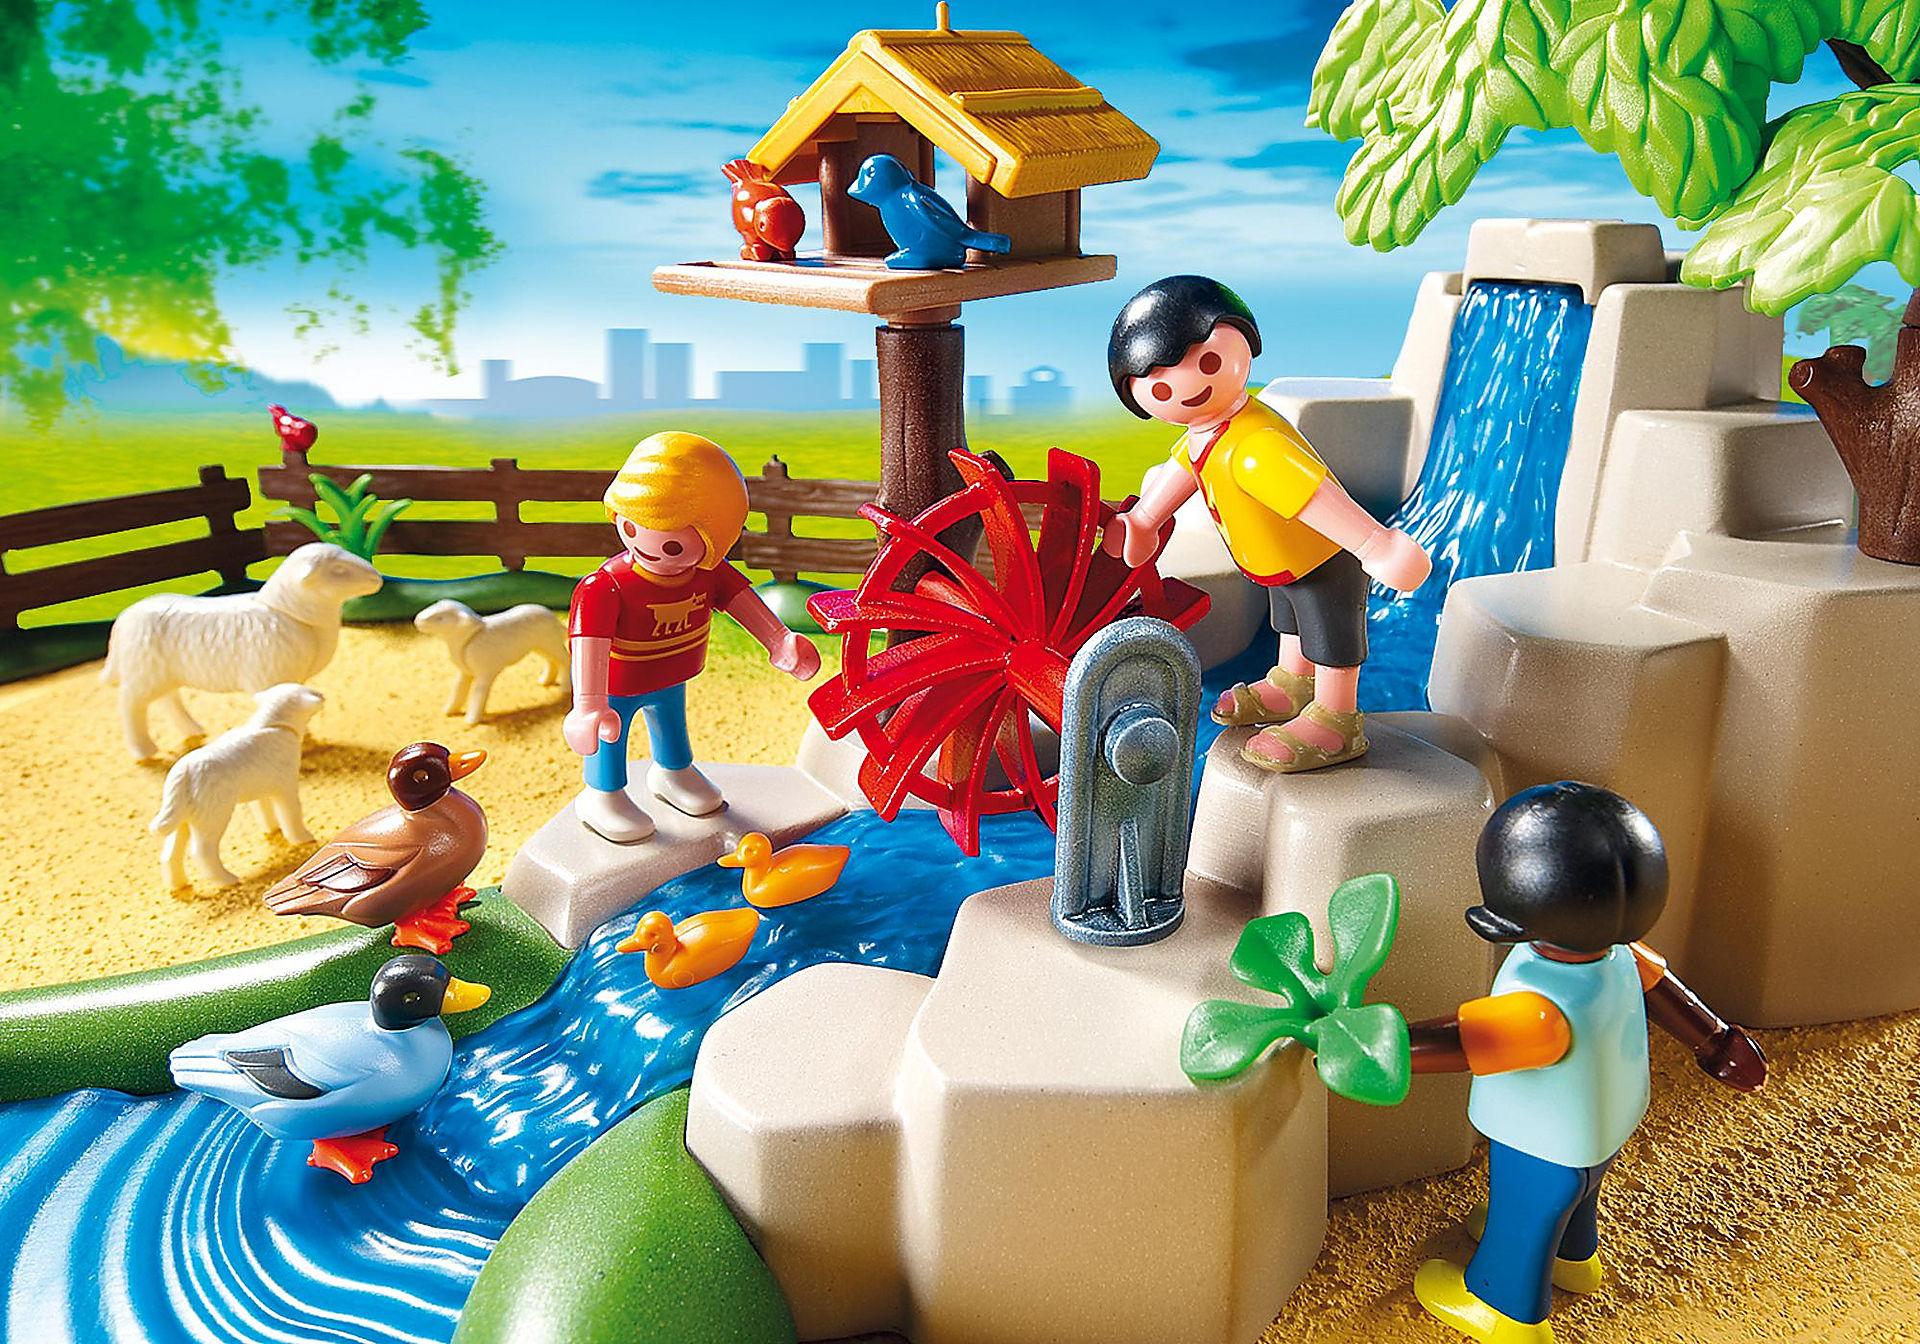 http://media.playmobil.com/i/playmobil/4851_product_extra2/Zoo per i bambini